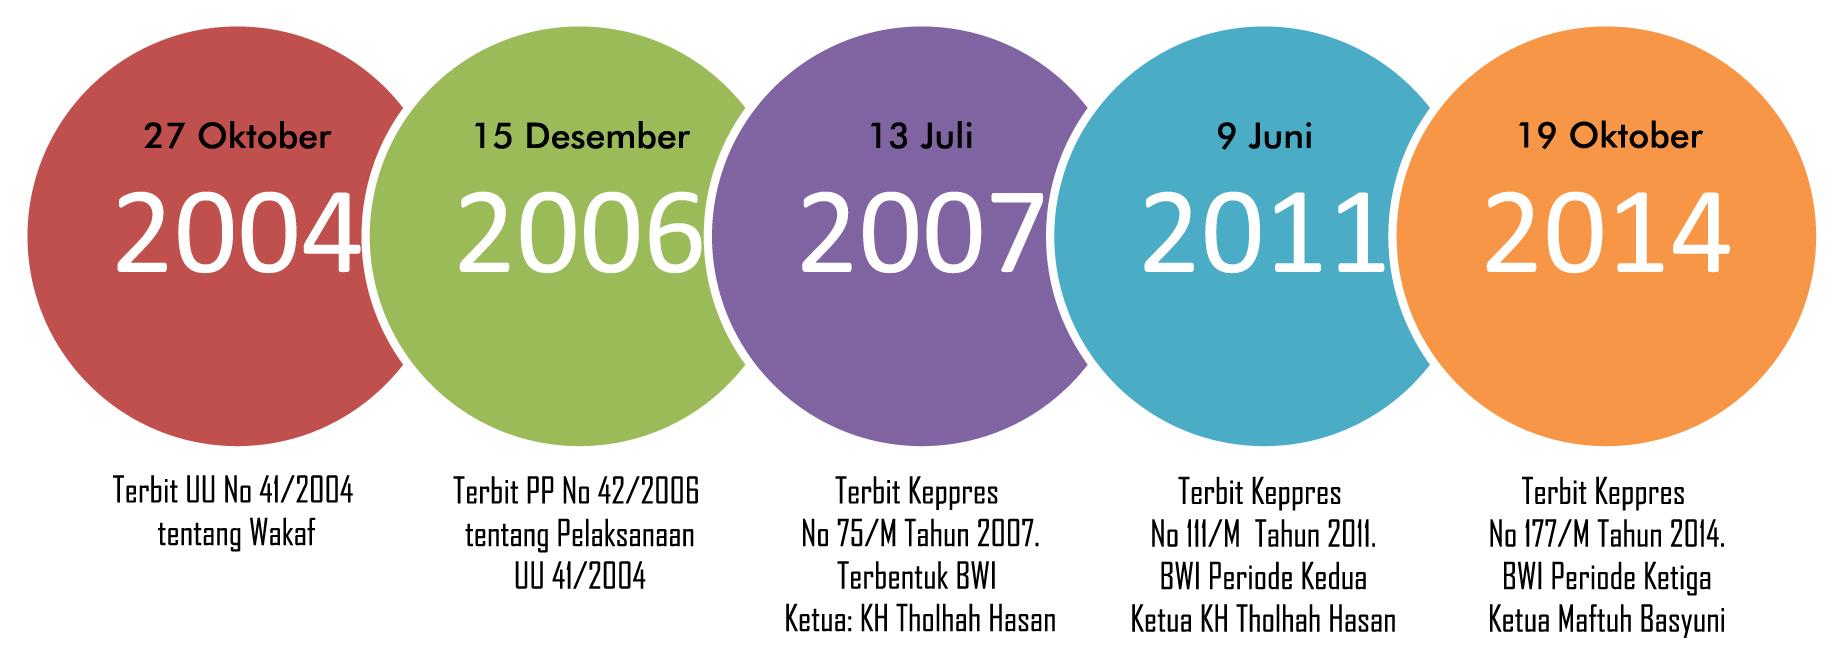 Tentang Badan Wakaf Indonesia (BWI)